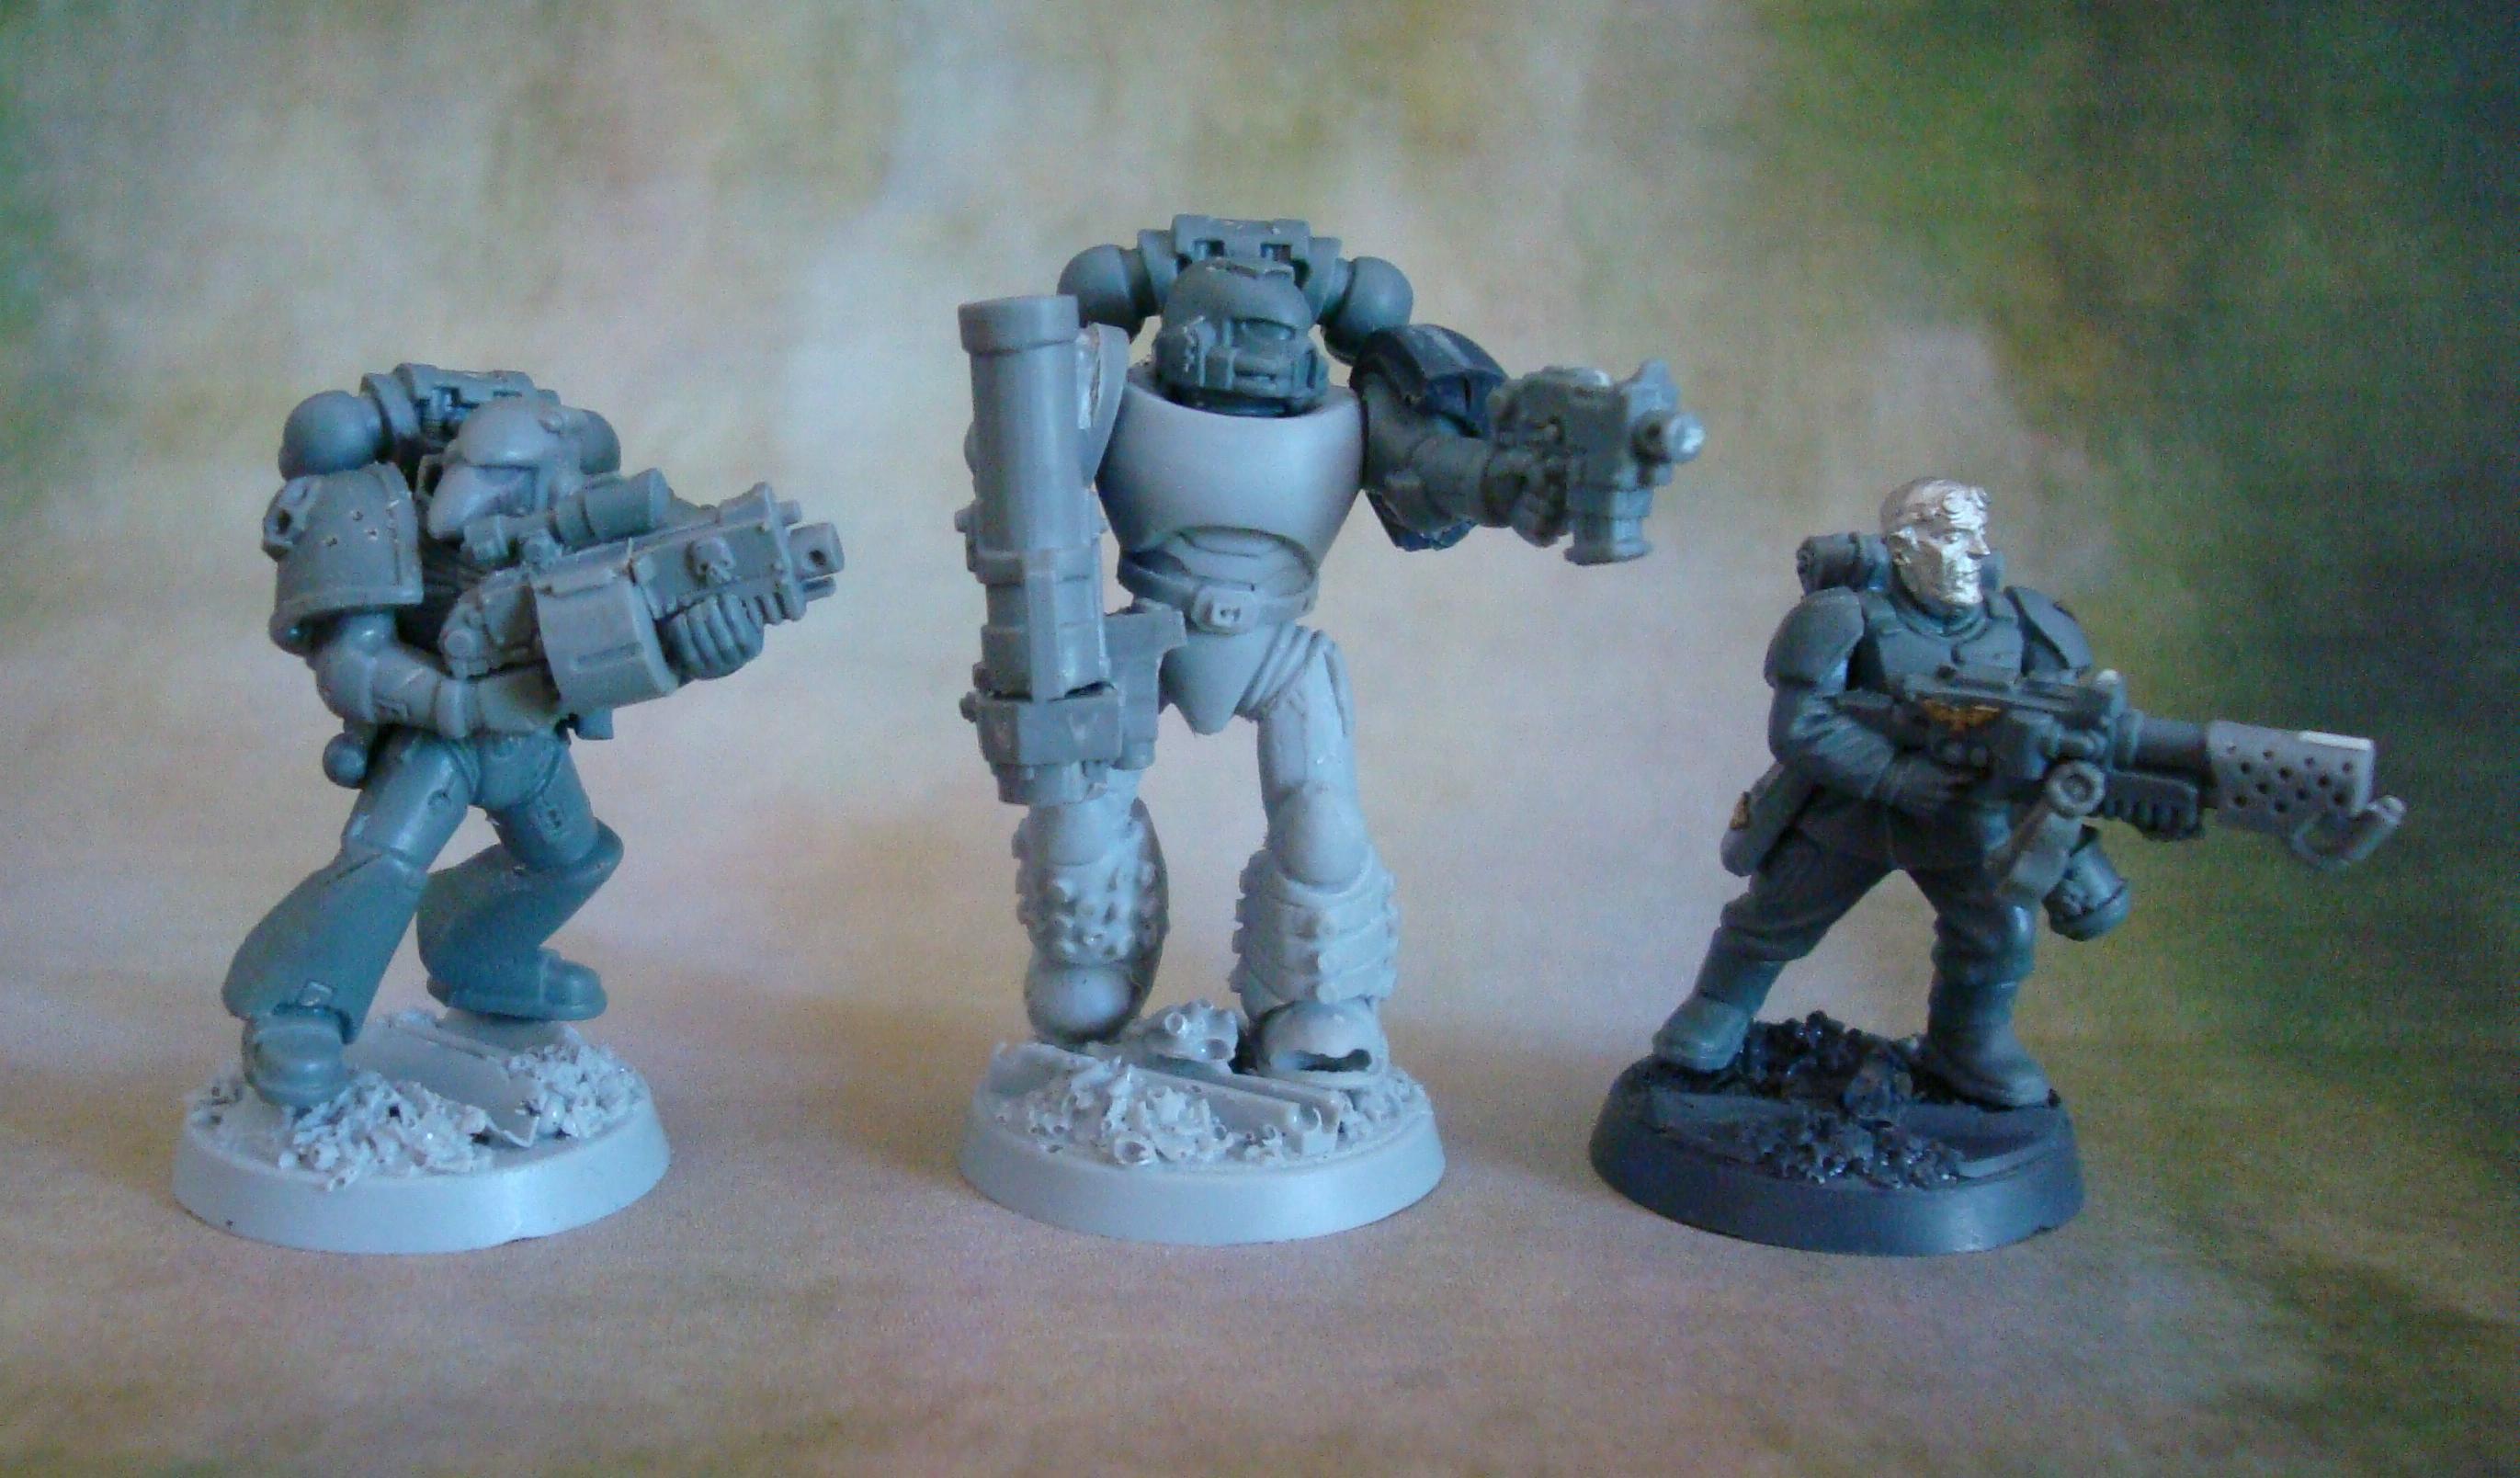 Space Marine Hunters, Space Marines, True Scale, Warhammer 40,000